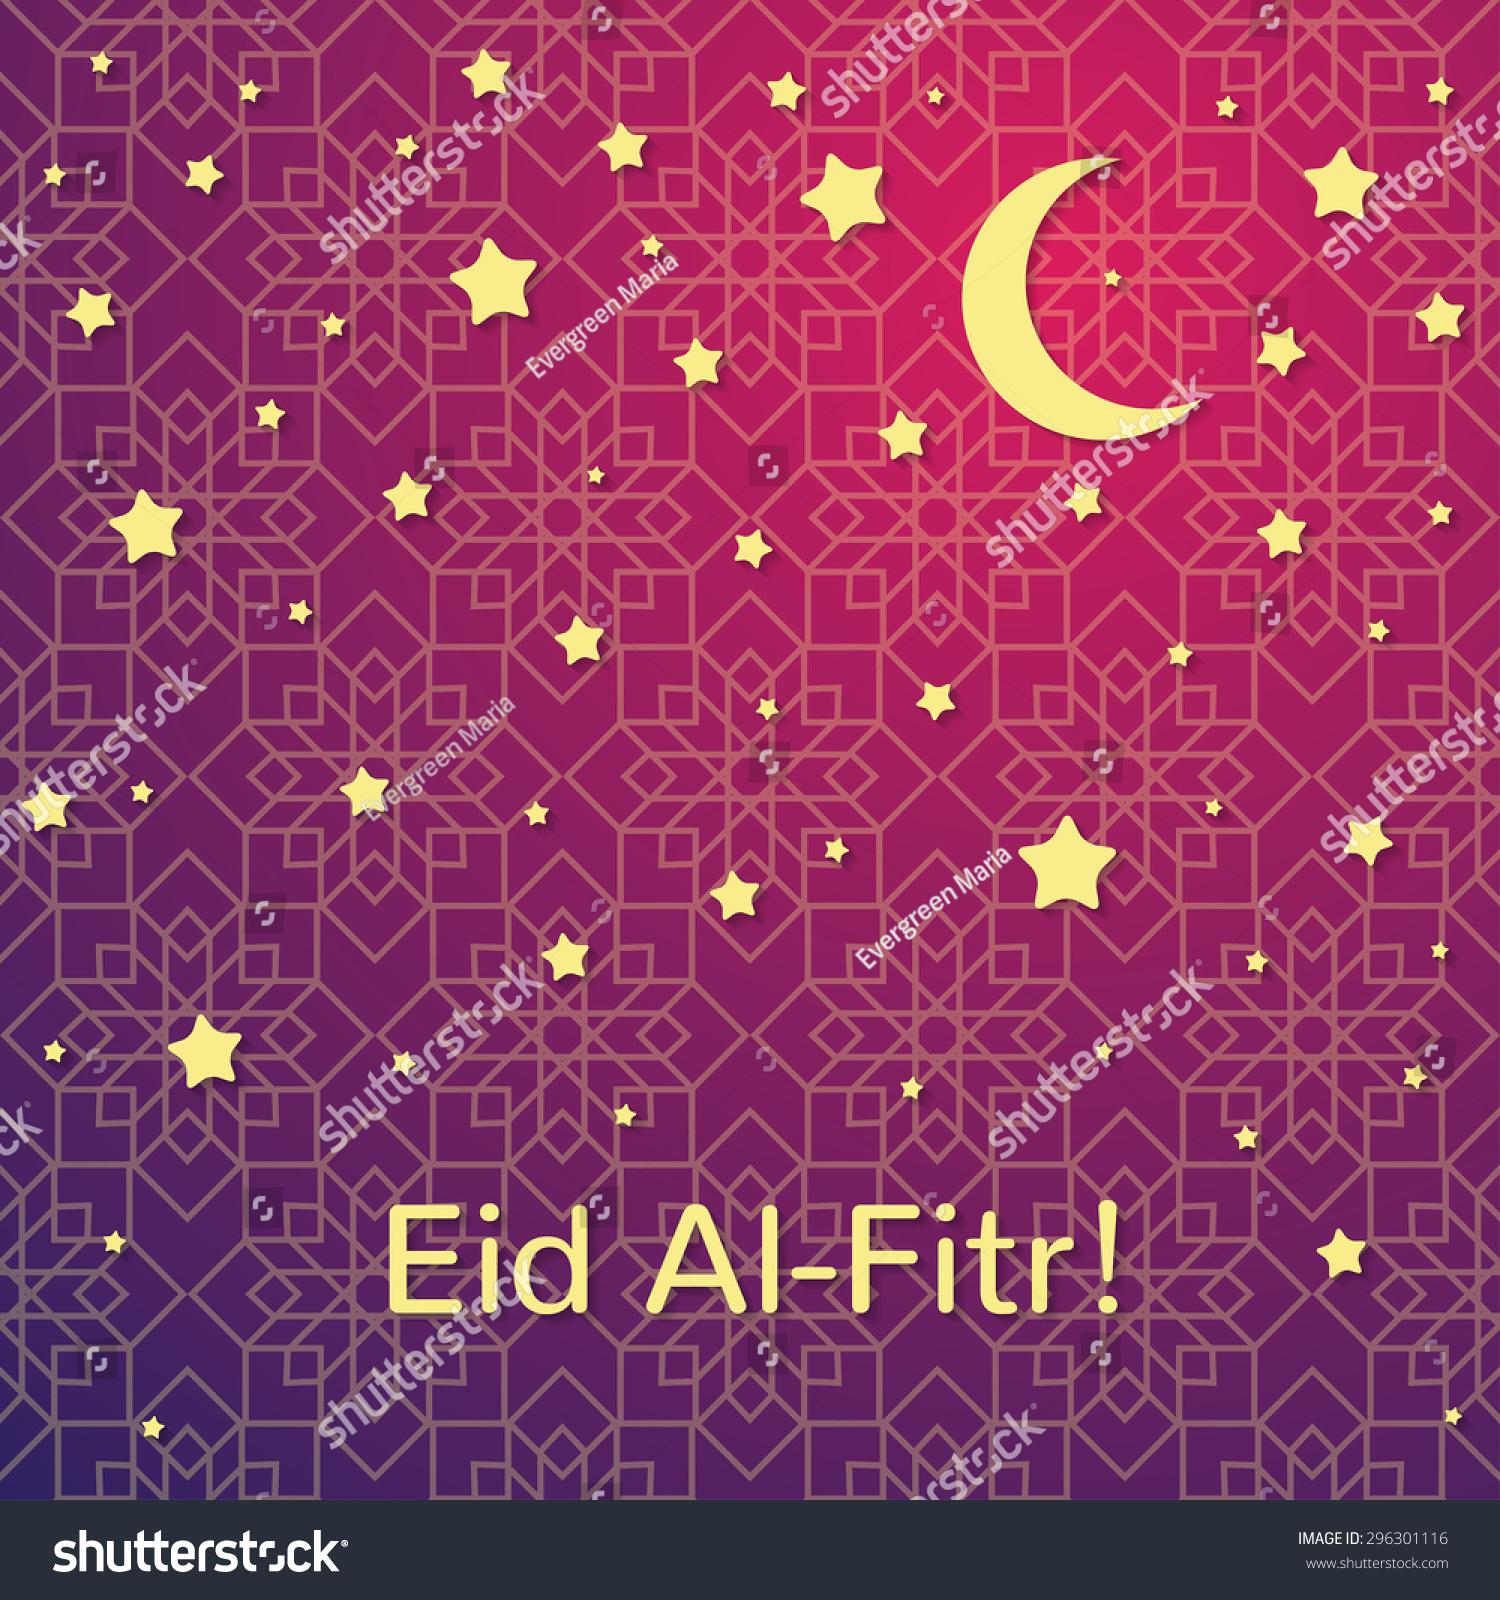 Simple Celebration Eid Al-Fitr Decorations - stock-vector-muslim-community-festival-eid-al-fitr-celebration-greeting-card-decorated-with-golden-stars-and-296301116  2018_697137 .jpg